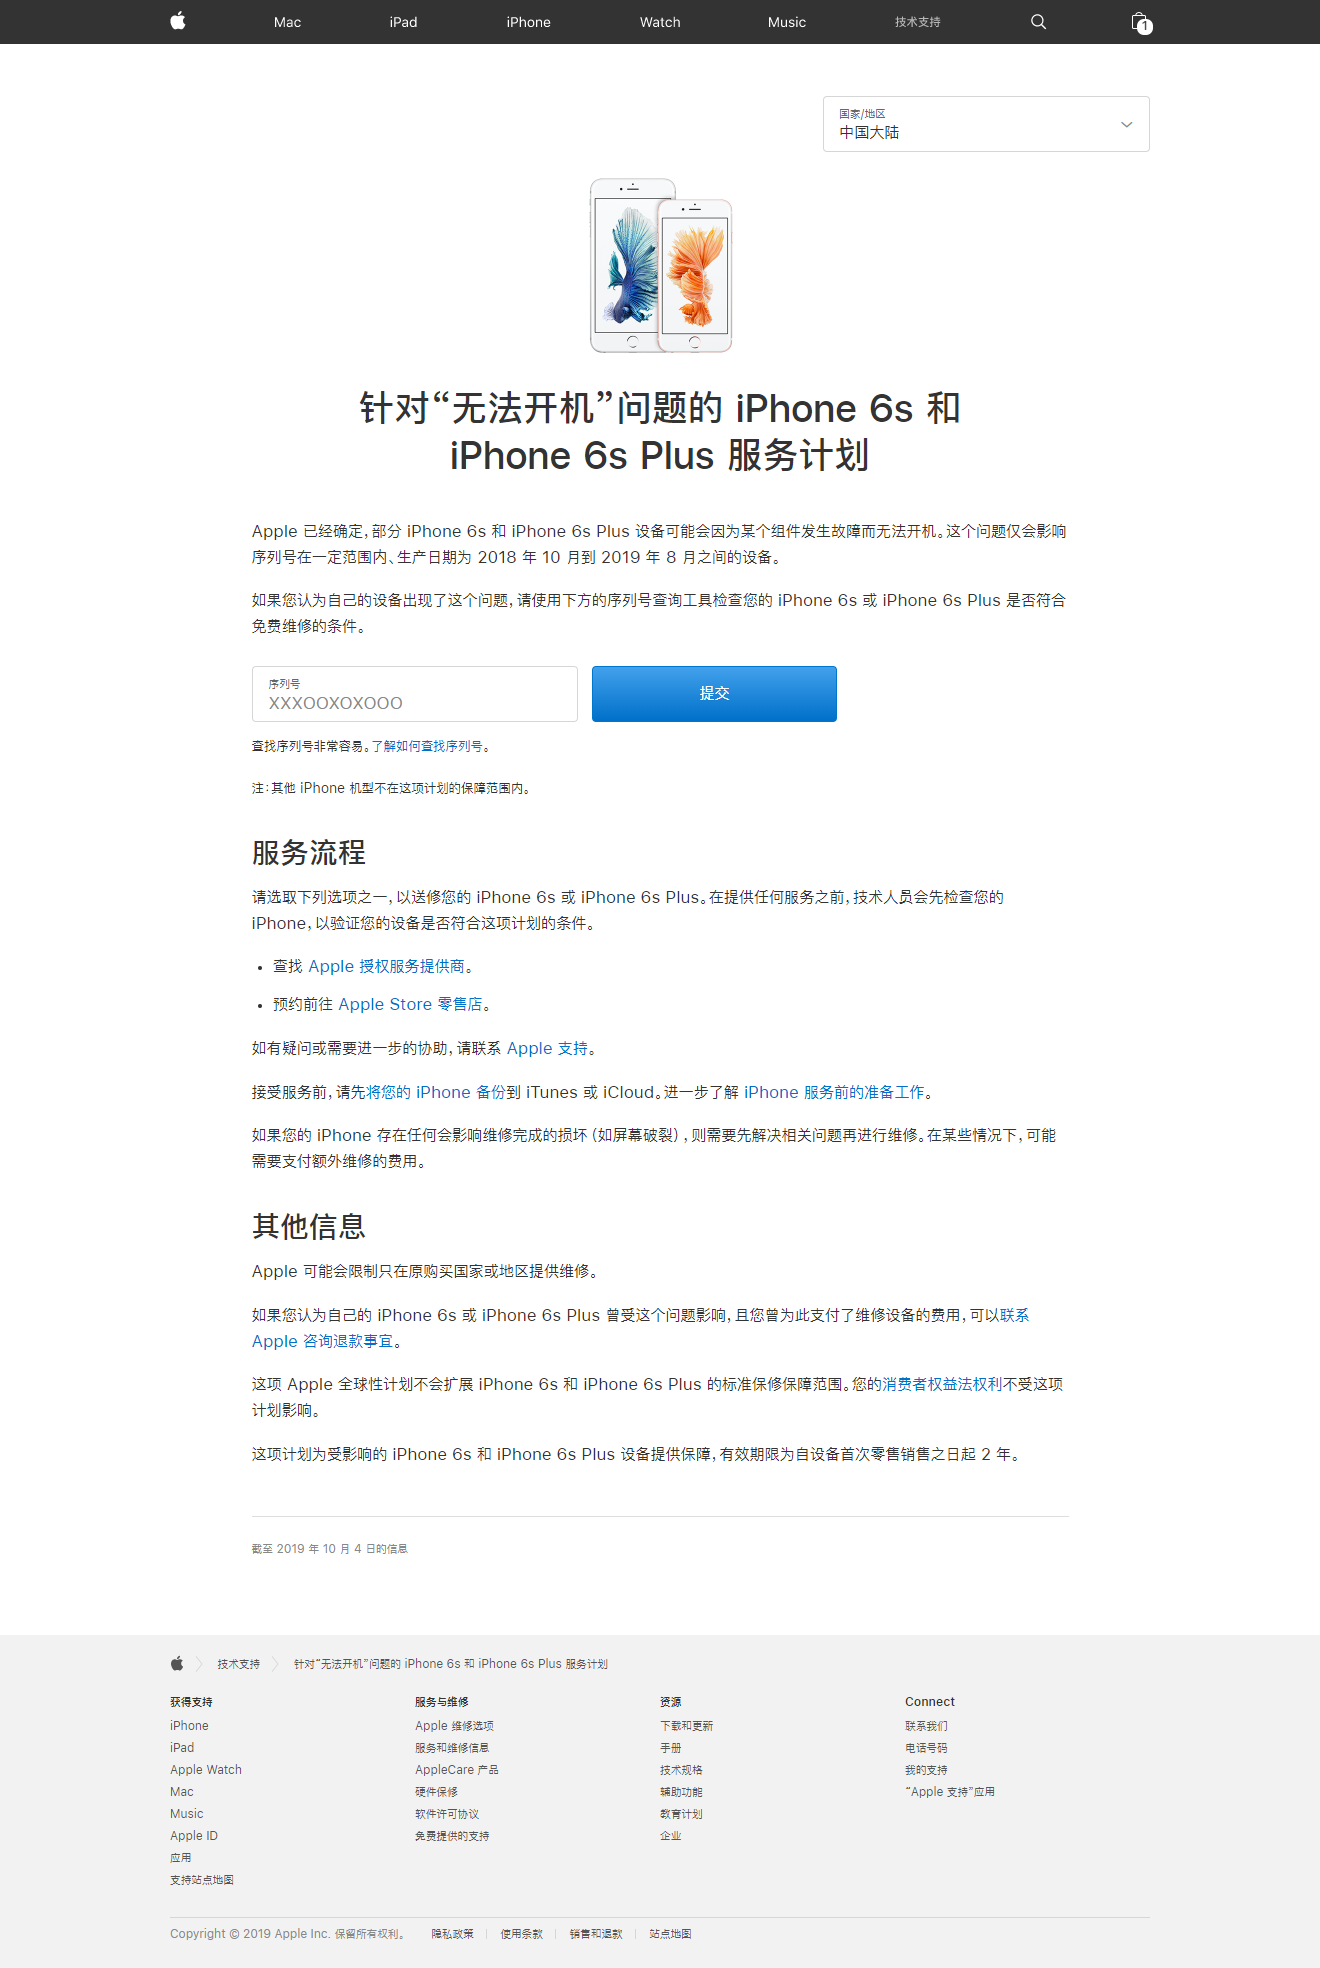 "FireShot Capture 136 - 针对""无法开机""问题的iPhone 6s 和 iPhone 6s Plus 服务计划 - Apple 支持 - support.apple.com.png"